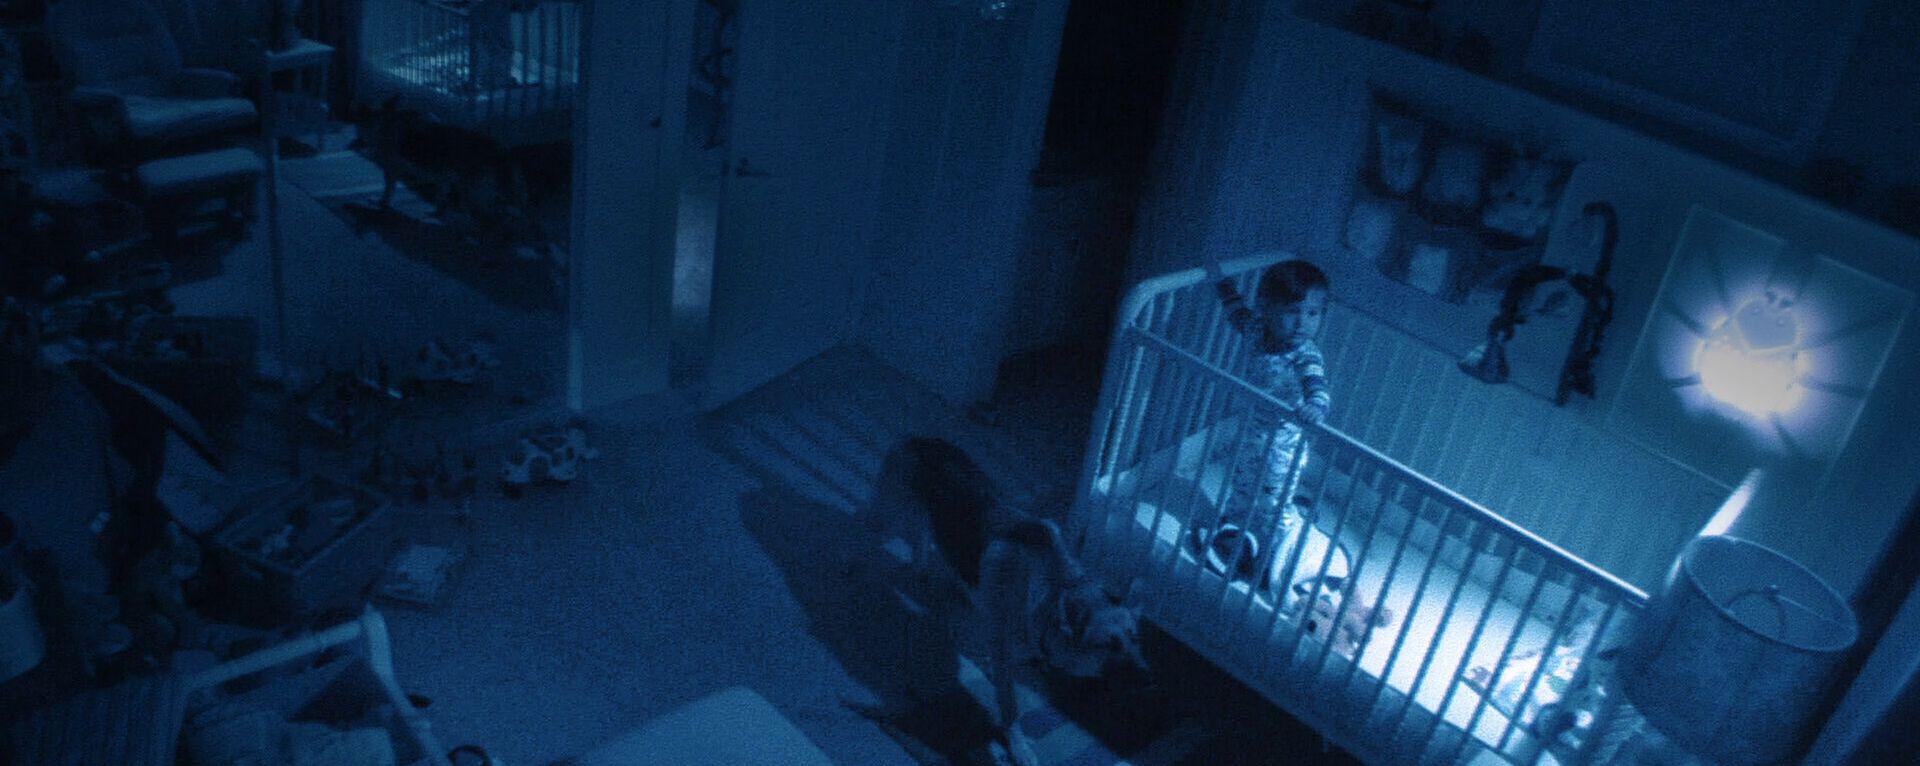 Review: Paranormal Activity 2 - Slant Magazine